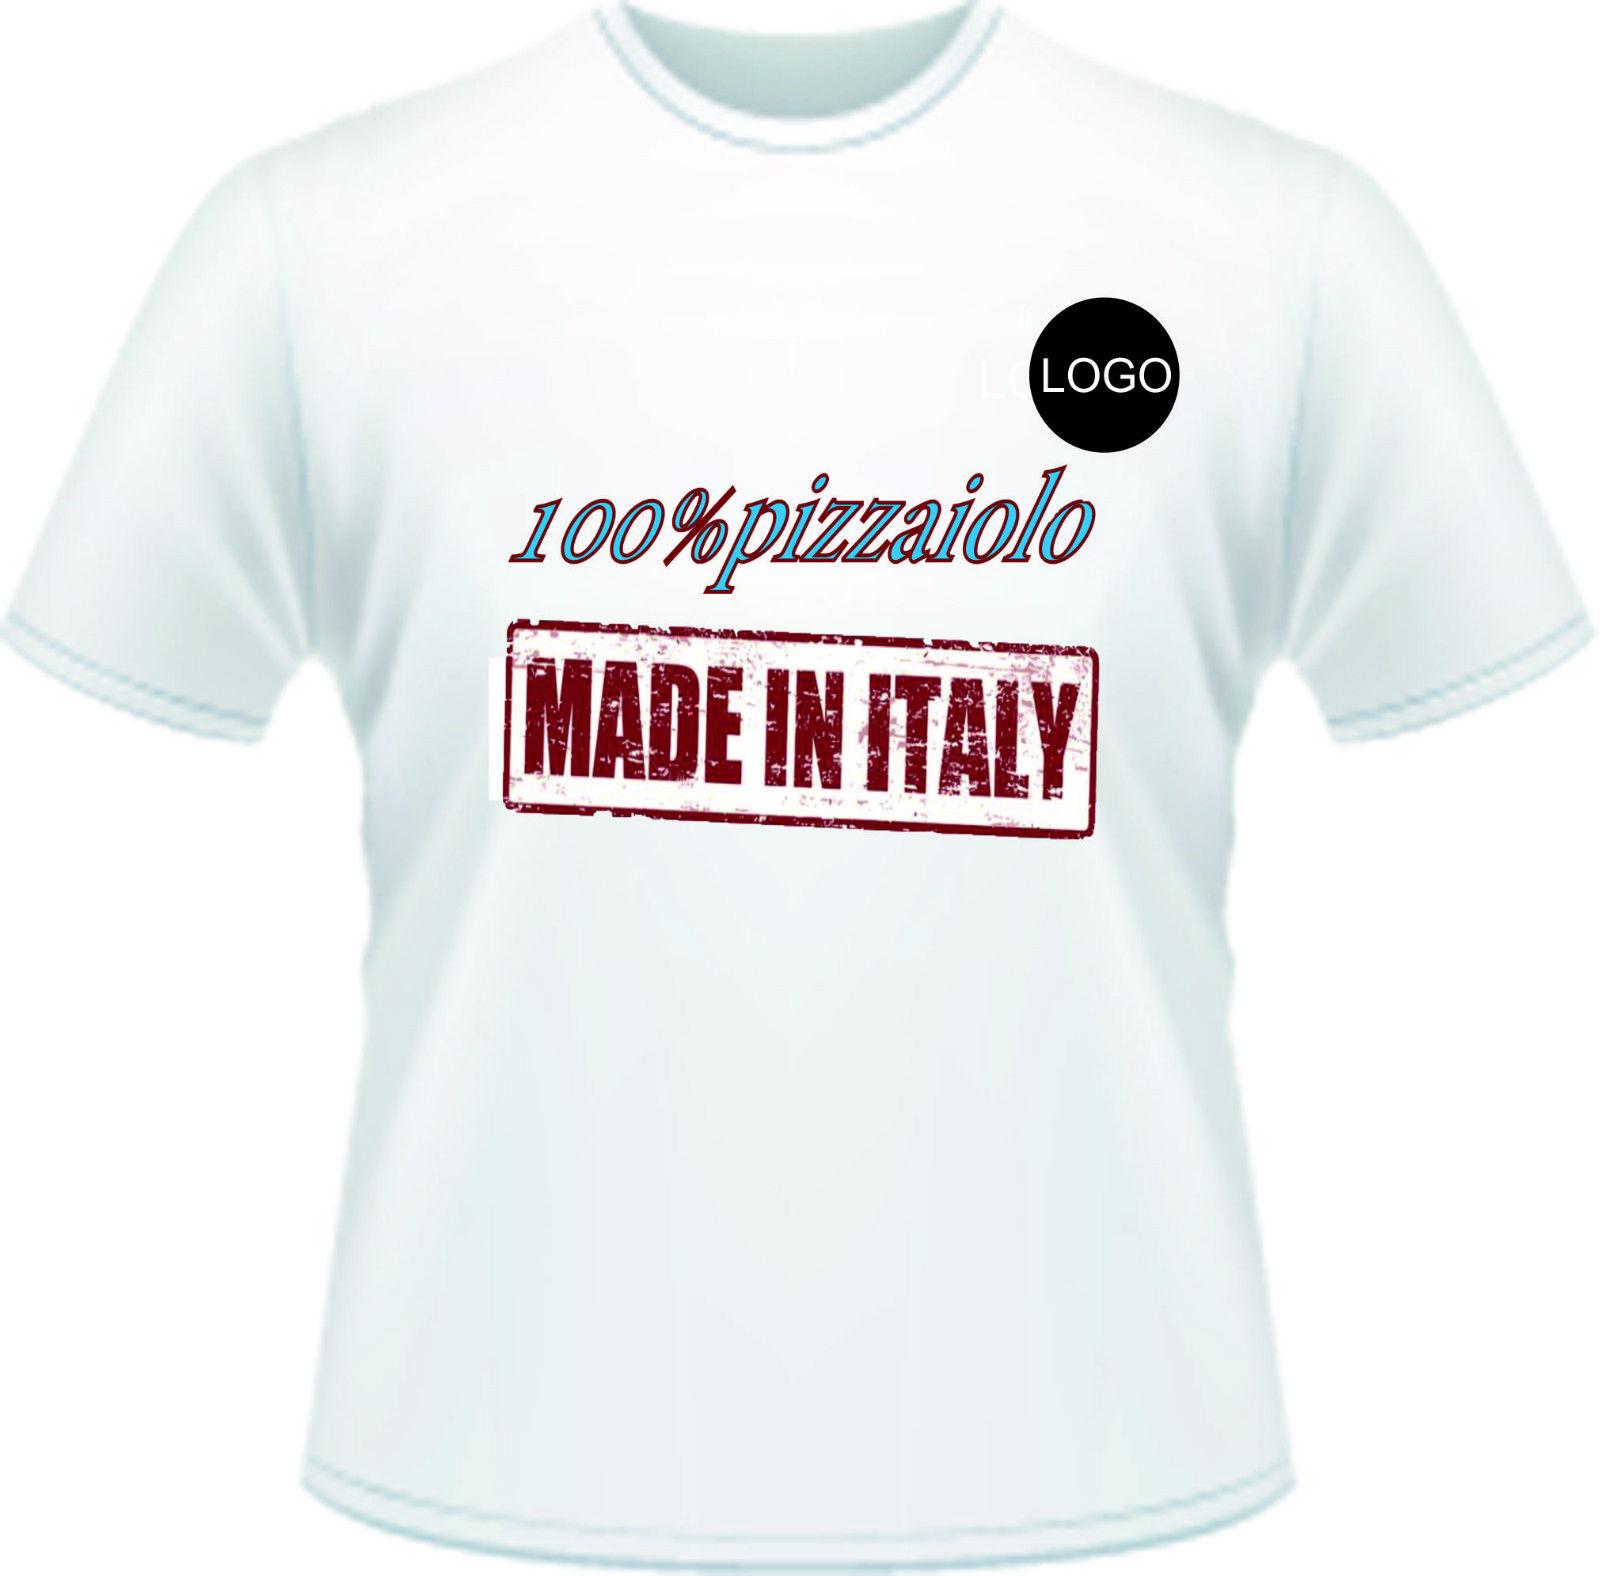 super popular b5ad3 00cef T-shirt Personalizzate da € 2,90! - TShirt-Express.it - La ...